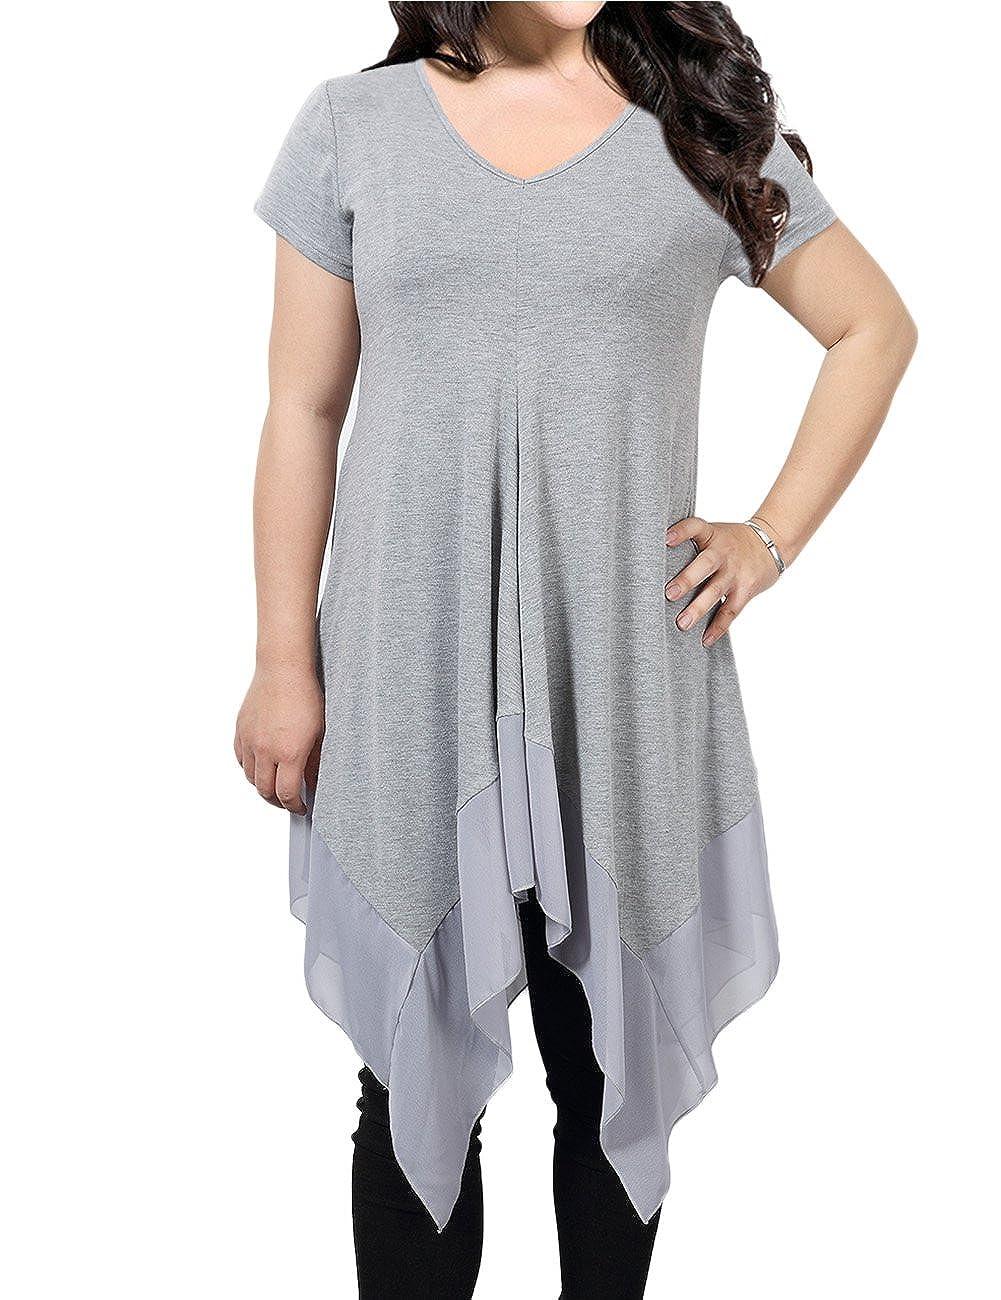 d3052076b08 Gprince Women Short Sleeve Loose Spliced Asymmetrical Plus Size Tunic Top  Short Dress Gray 4XL: Amazon.ca: Clothing & Accessories